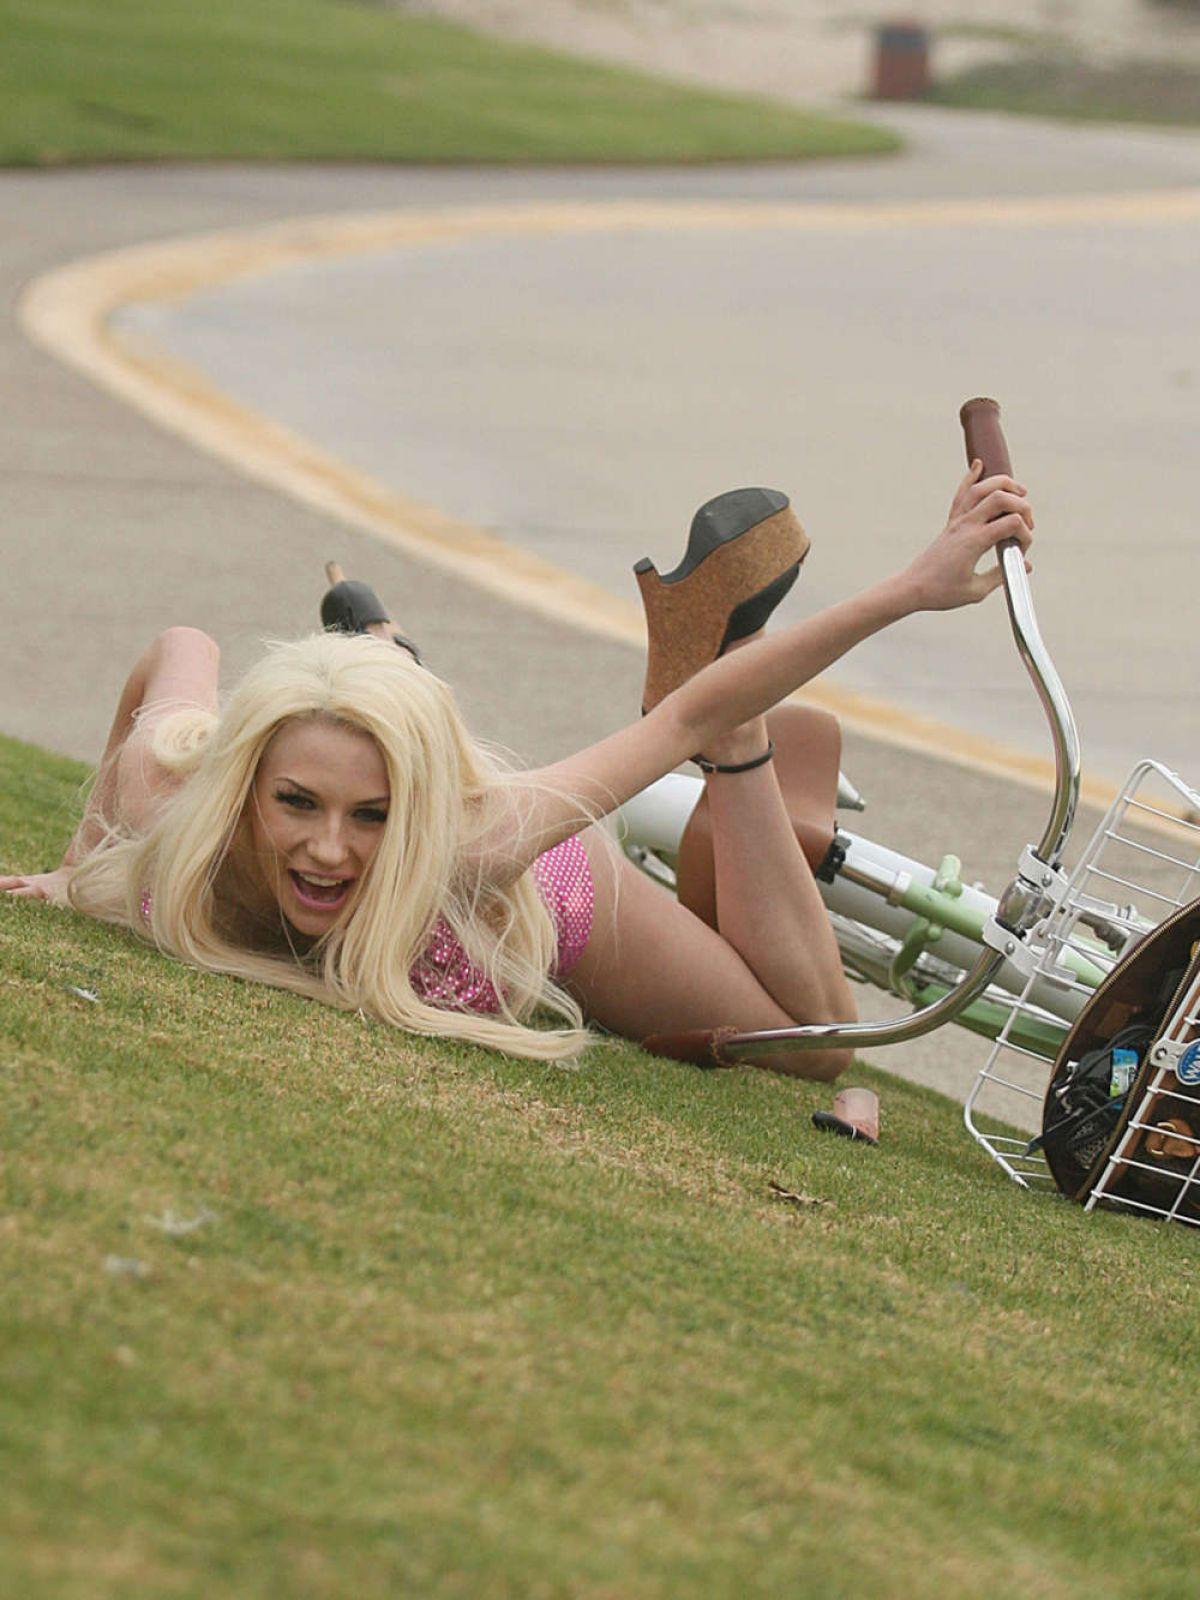 ourtney-stodden-falls-off-her-bike-in-los-angeles_11.jpg